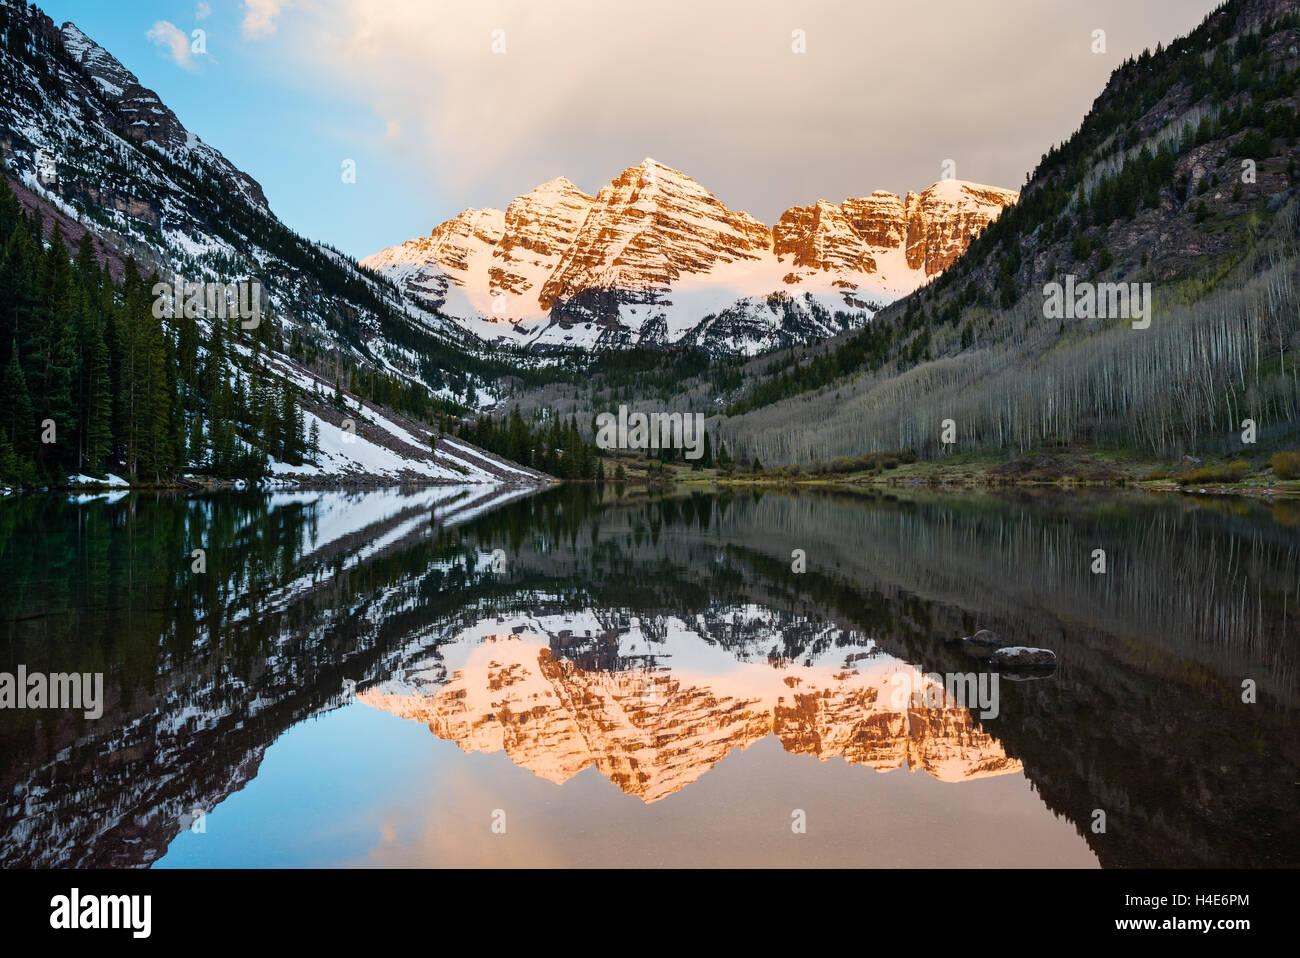 Maroon Bells peak at Maroon lake, Aspen, Colorado at sunrise - Stock Image